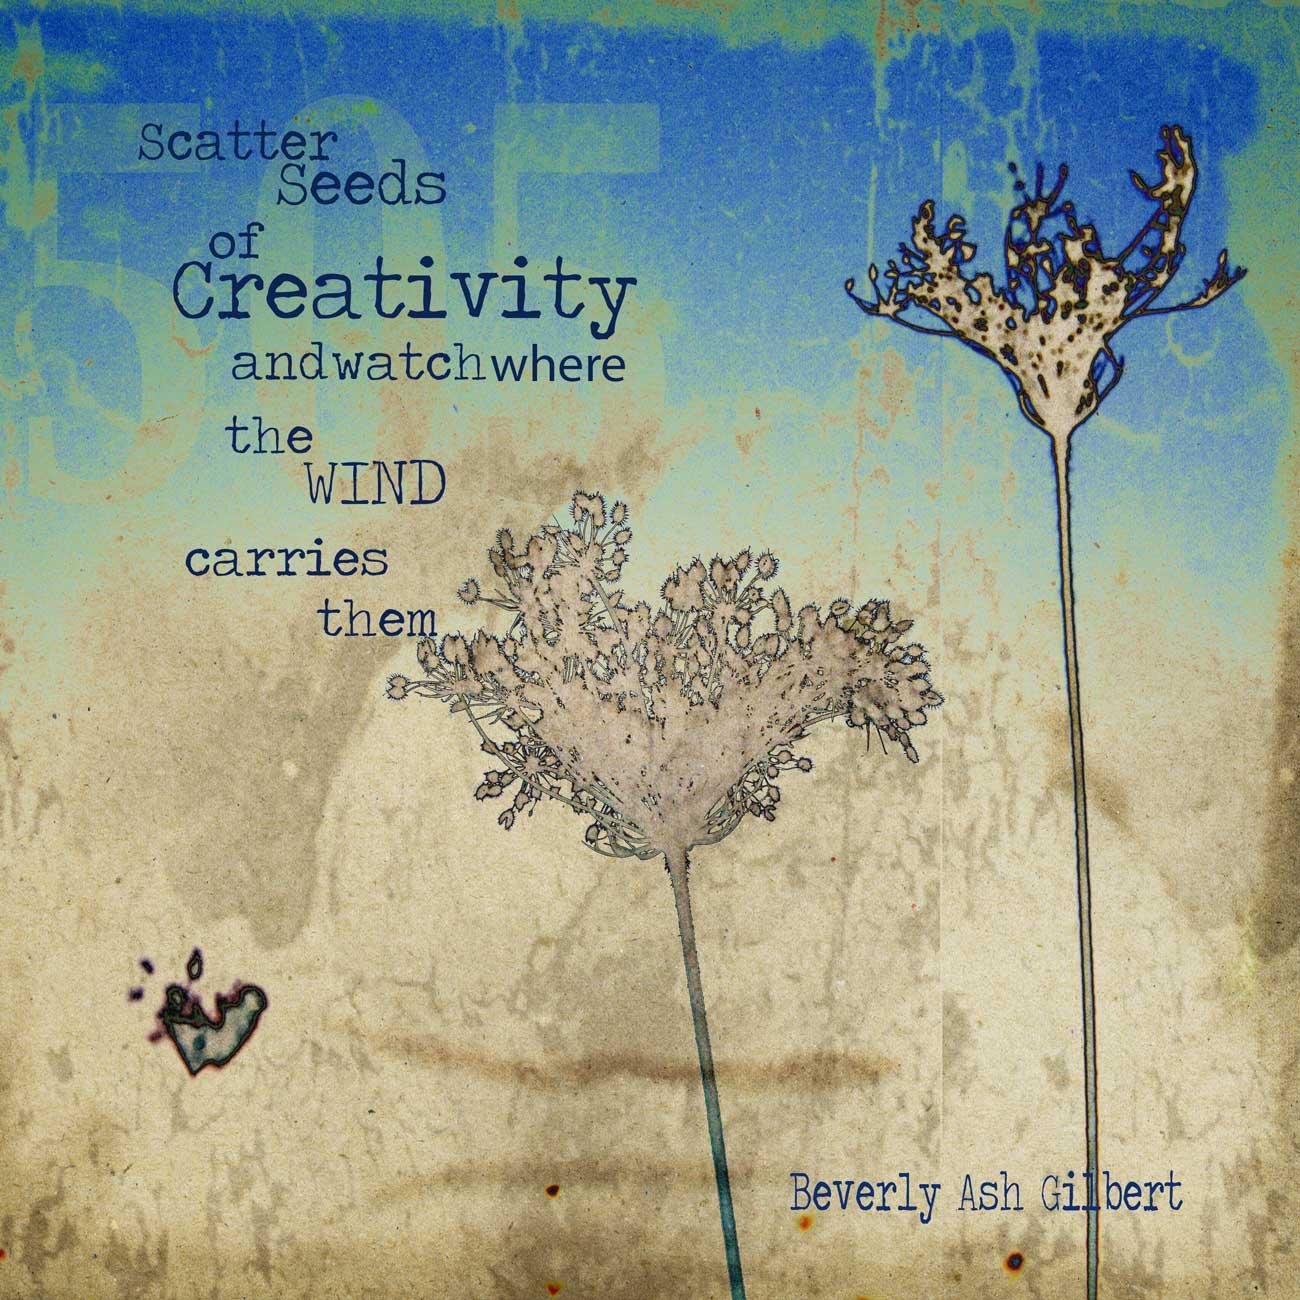 Positive_Inspiration_ScatterSeeds.jpg